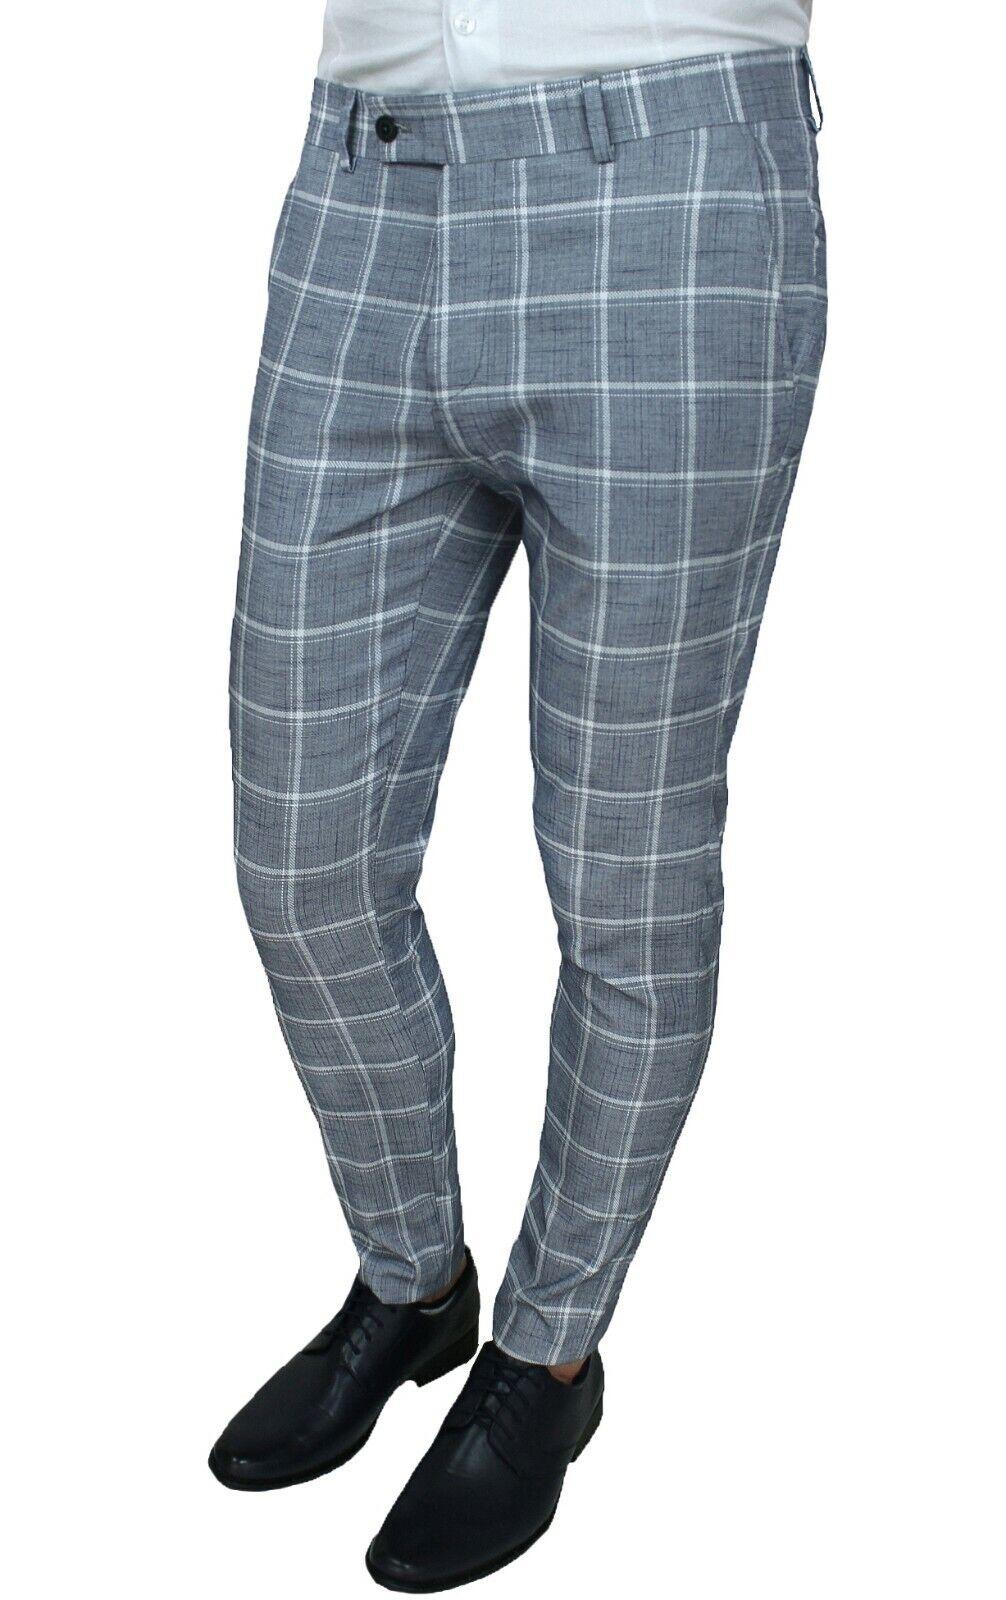 2b5e314e1f05 Pantaloni uomo sartoriali grigio fantasia quadri eleganti casual 100% made  Italy